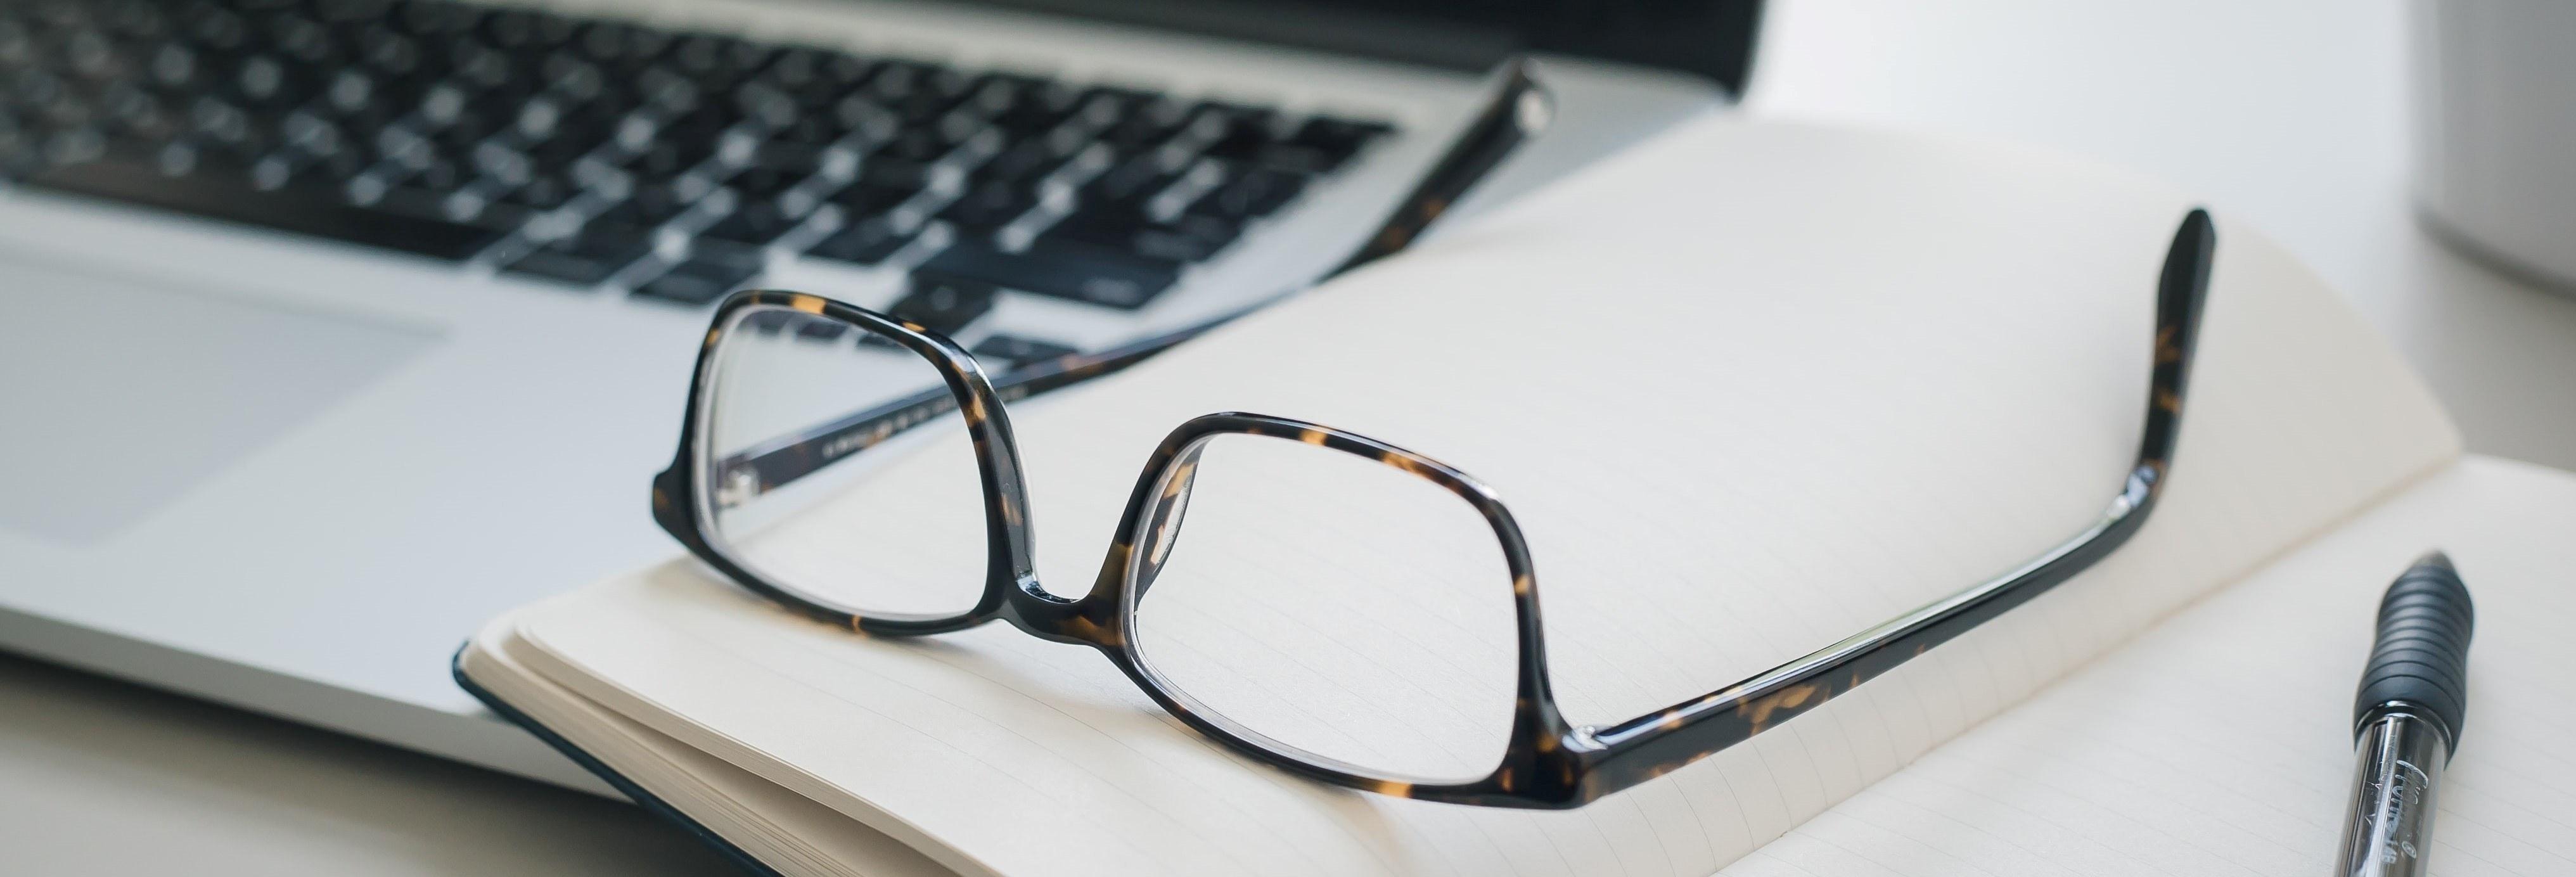 The benefits of blogging work station image